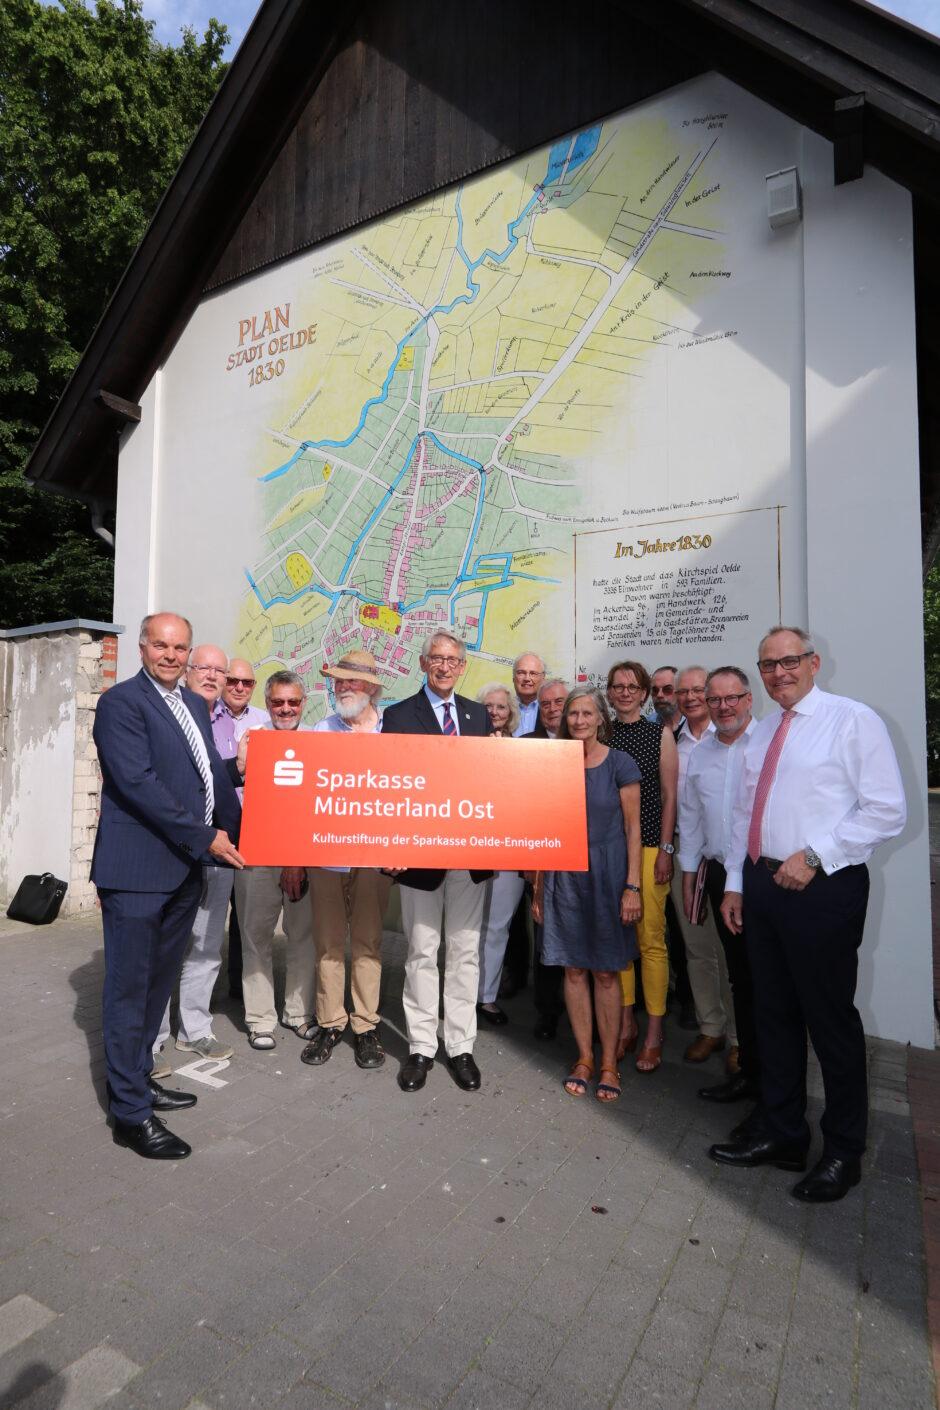 Historischer Stadtplan schmückt Oelder Heimathaus